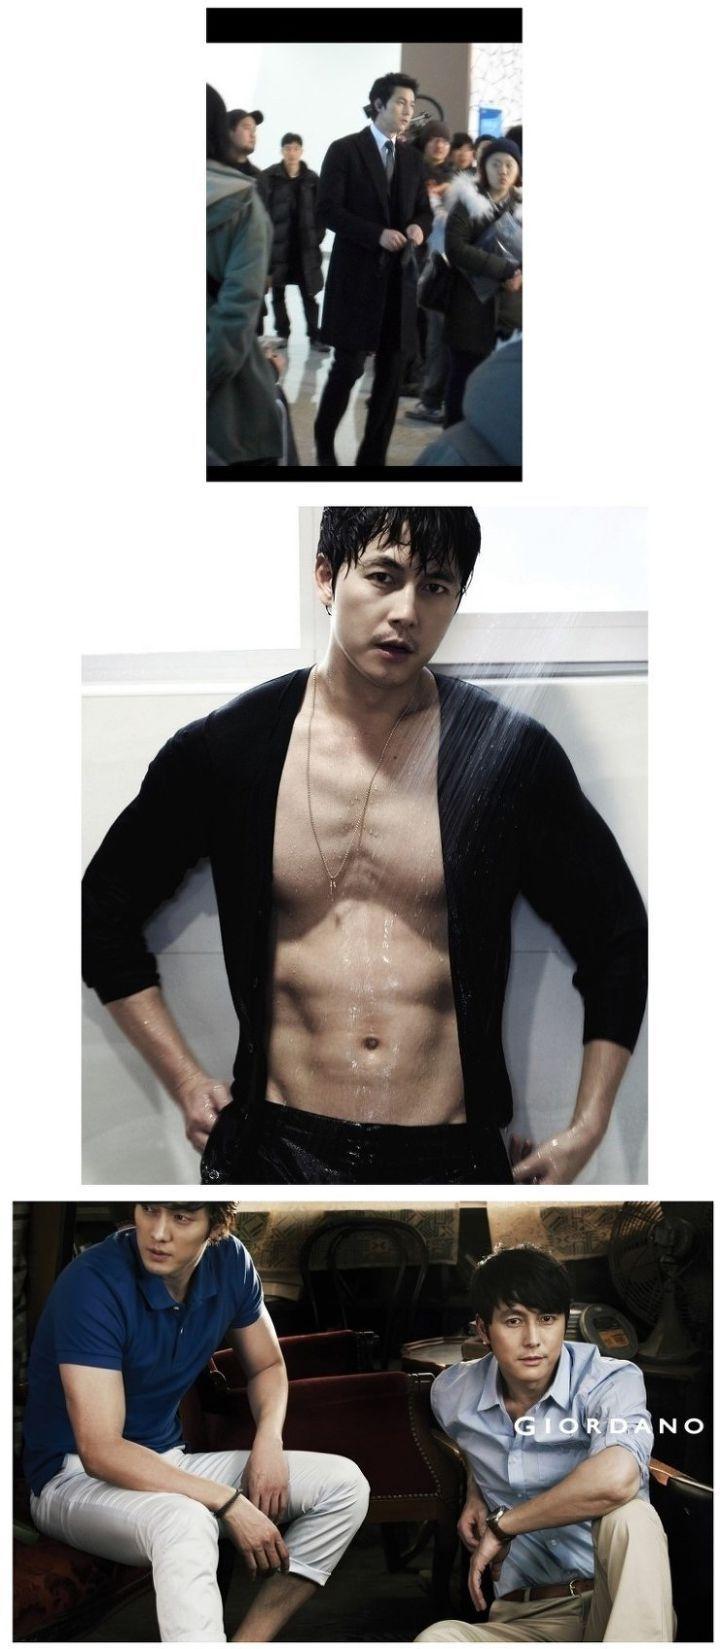 "˧ì´ ͕""요없는 Ì•ìš°ì""± ˦¬ì¦ˆì‹œìˆ ķㄷㄷㄷ Jung Woo Sung Jung Woo Woo Sung"